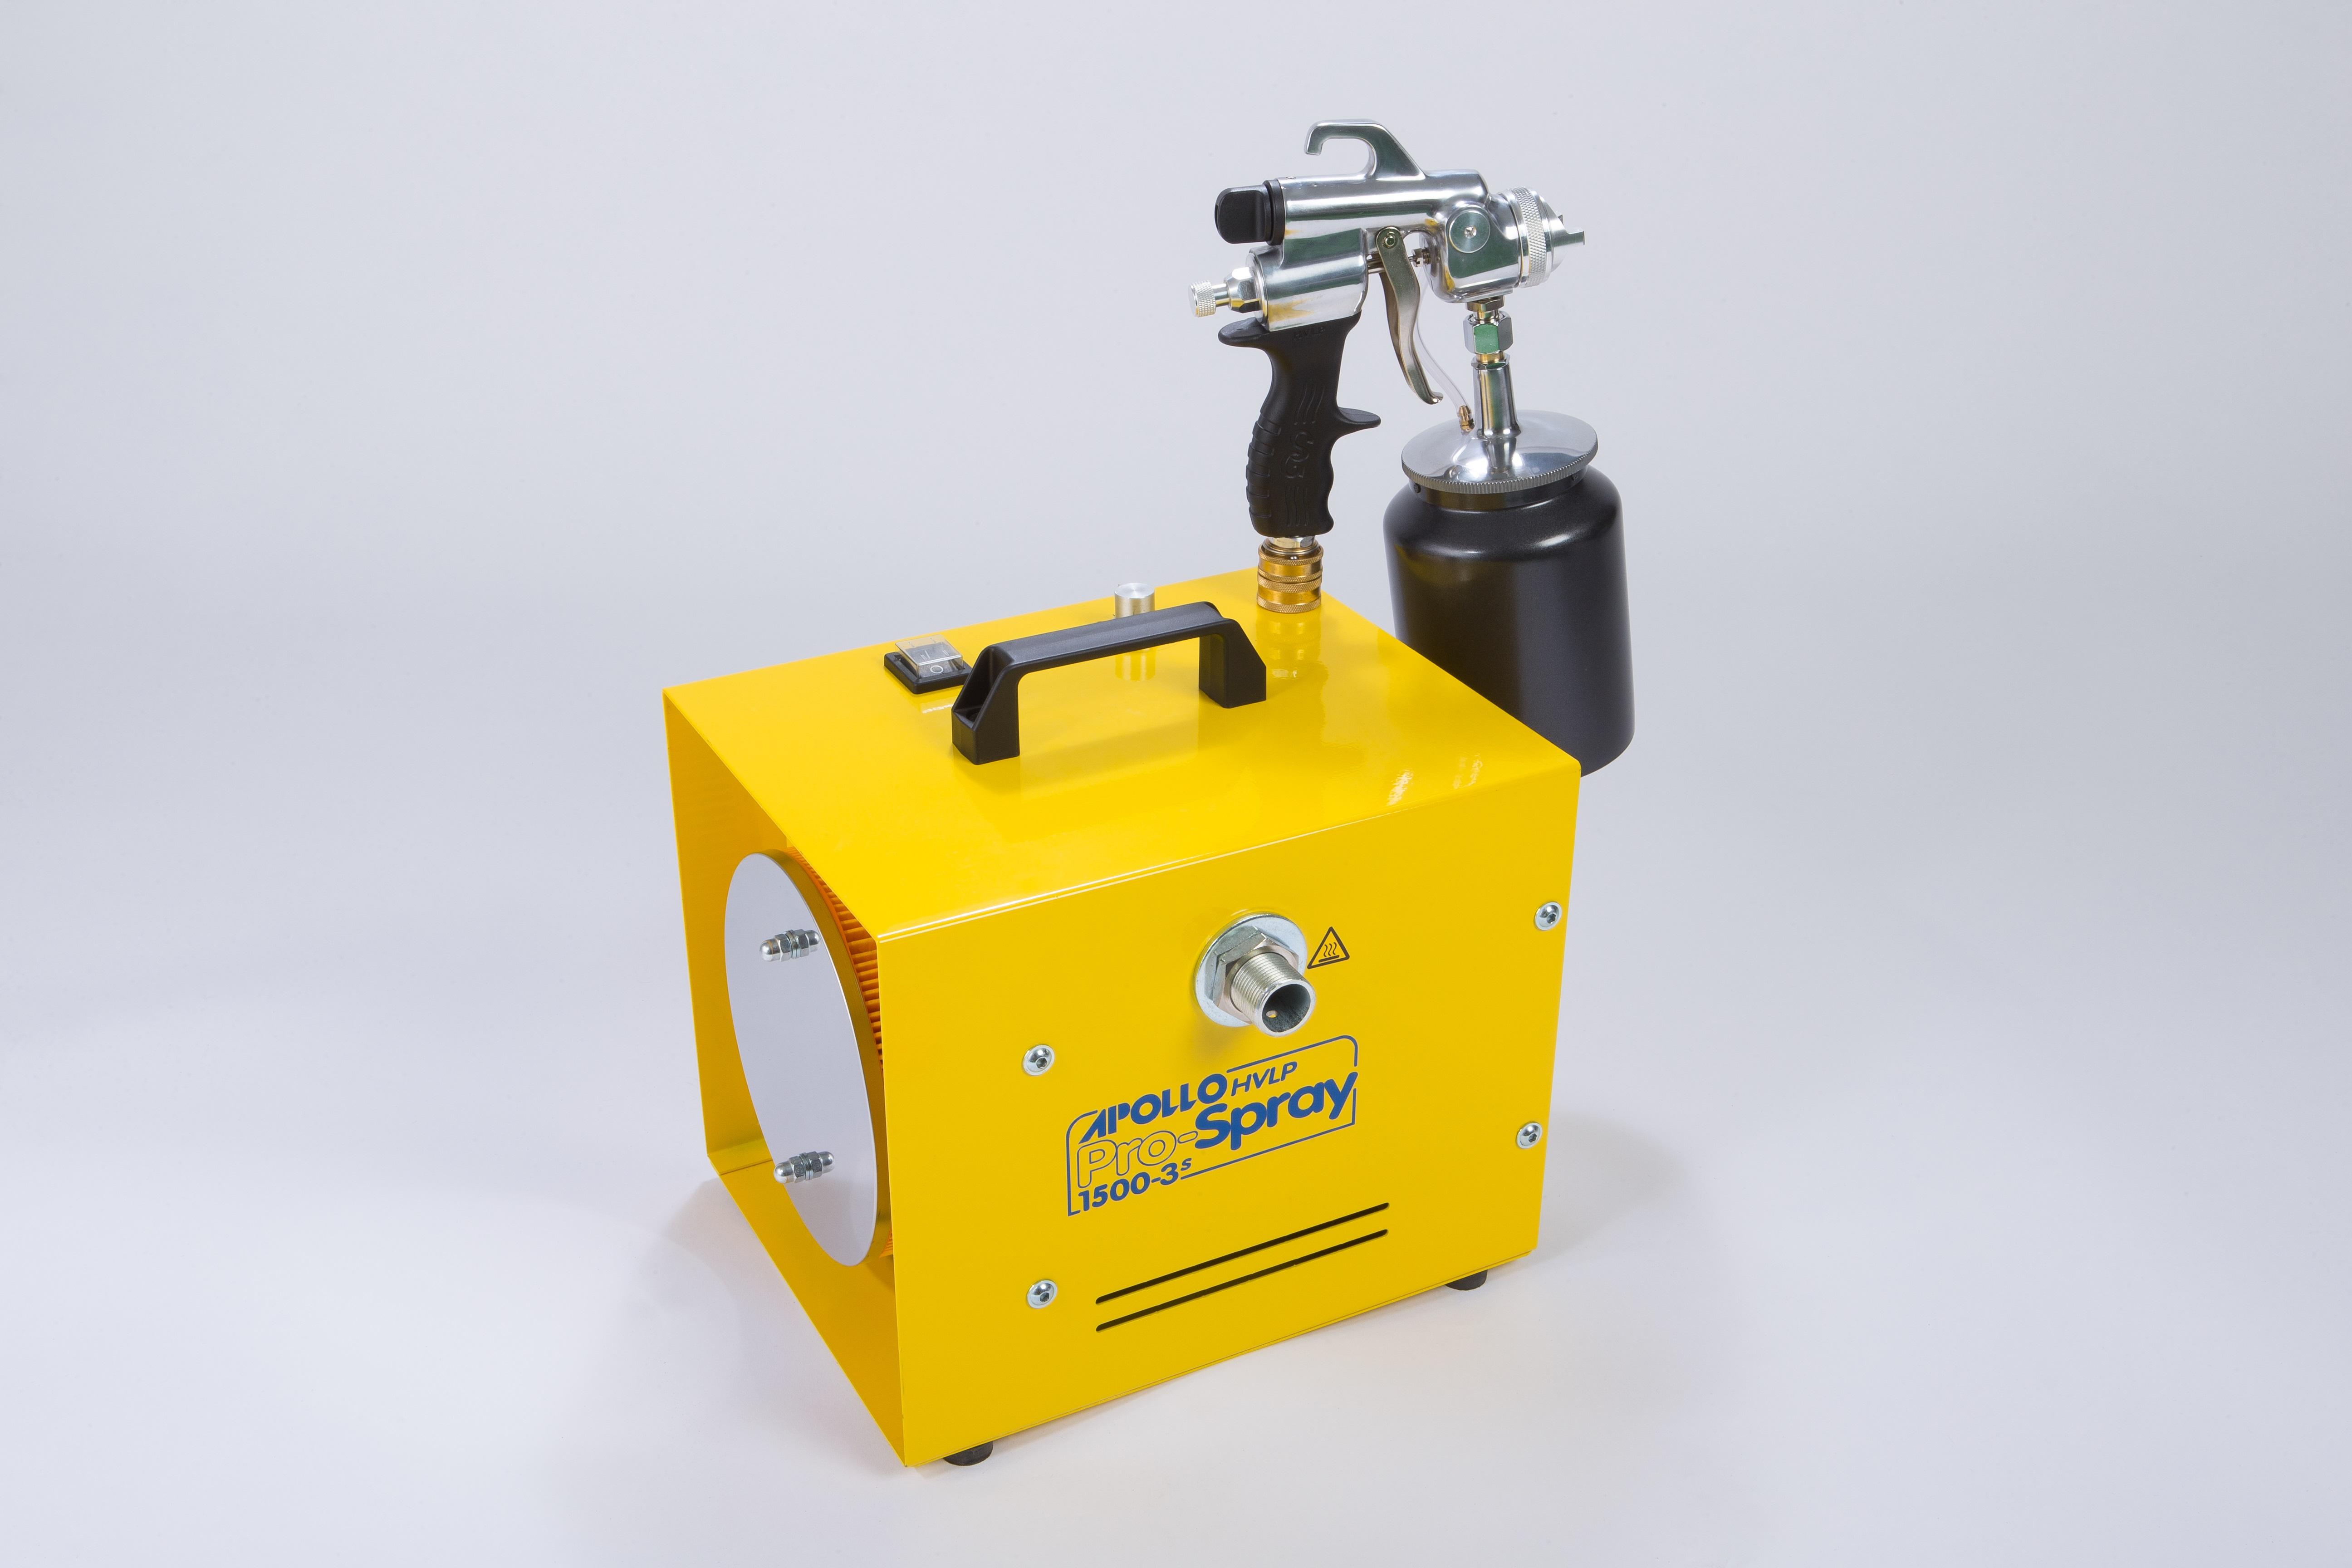 Apollo Pro Spray 1500 3s Vari Speed Professional Hvlp